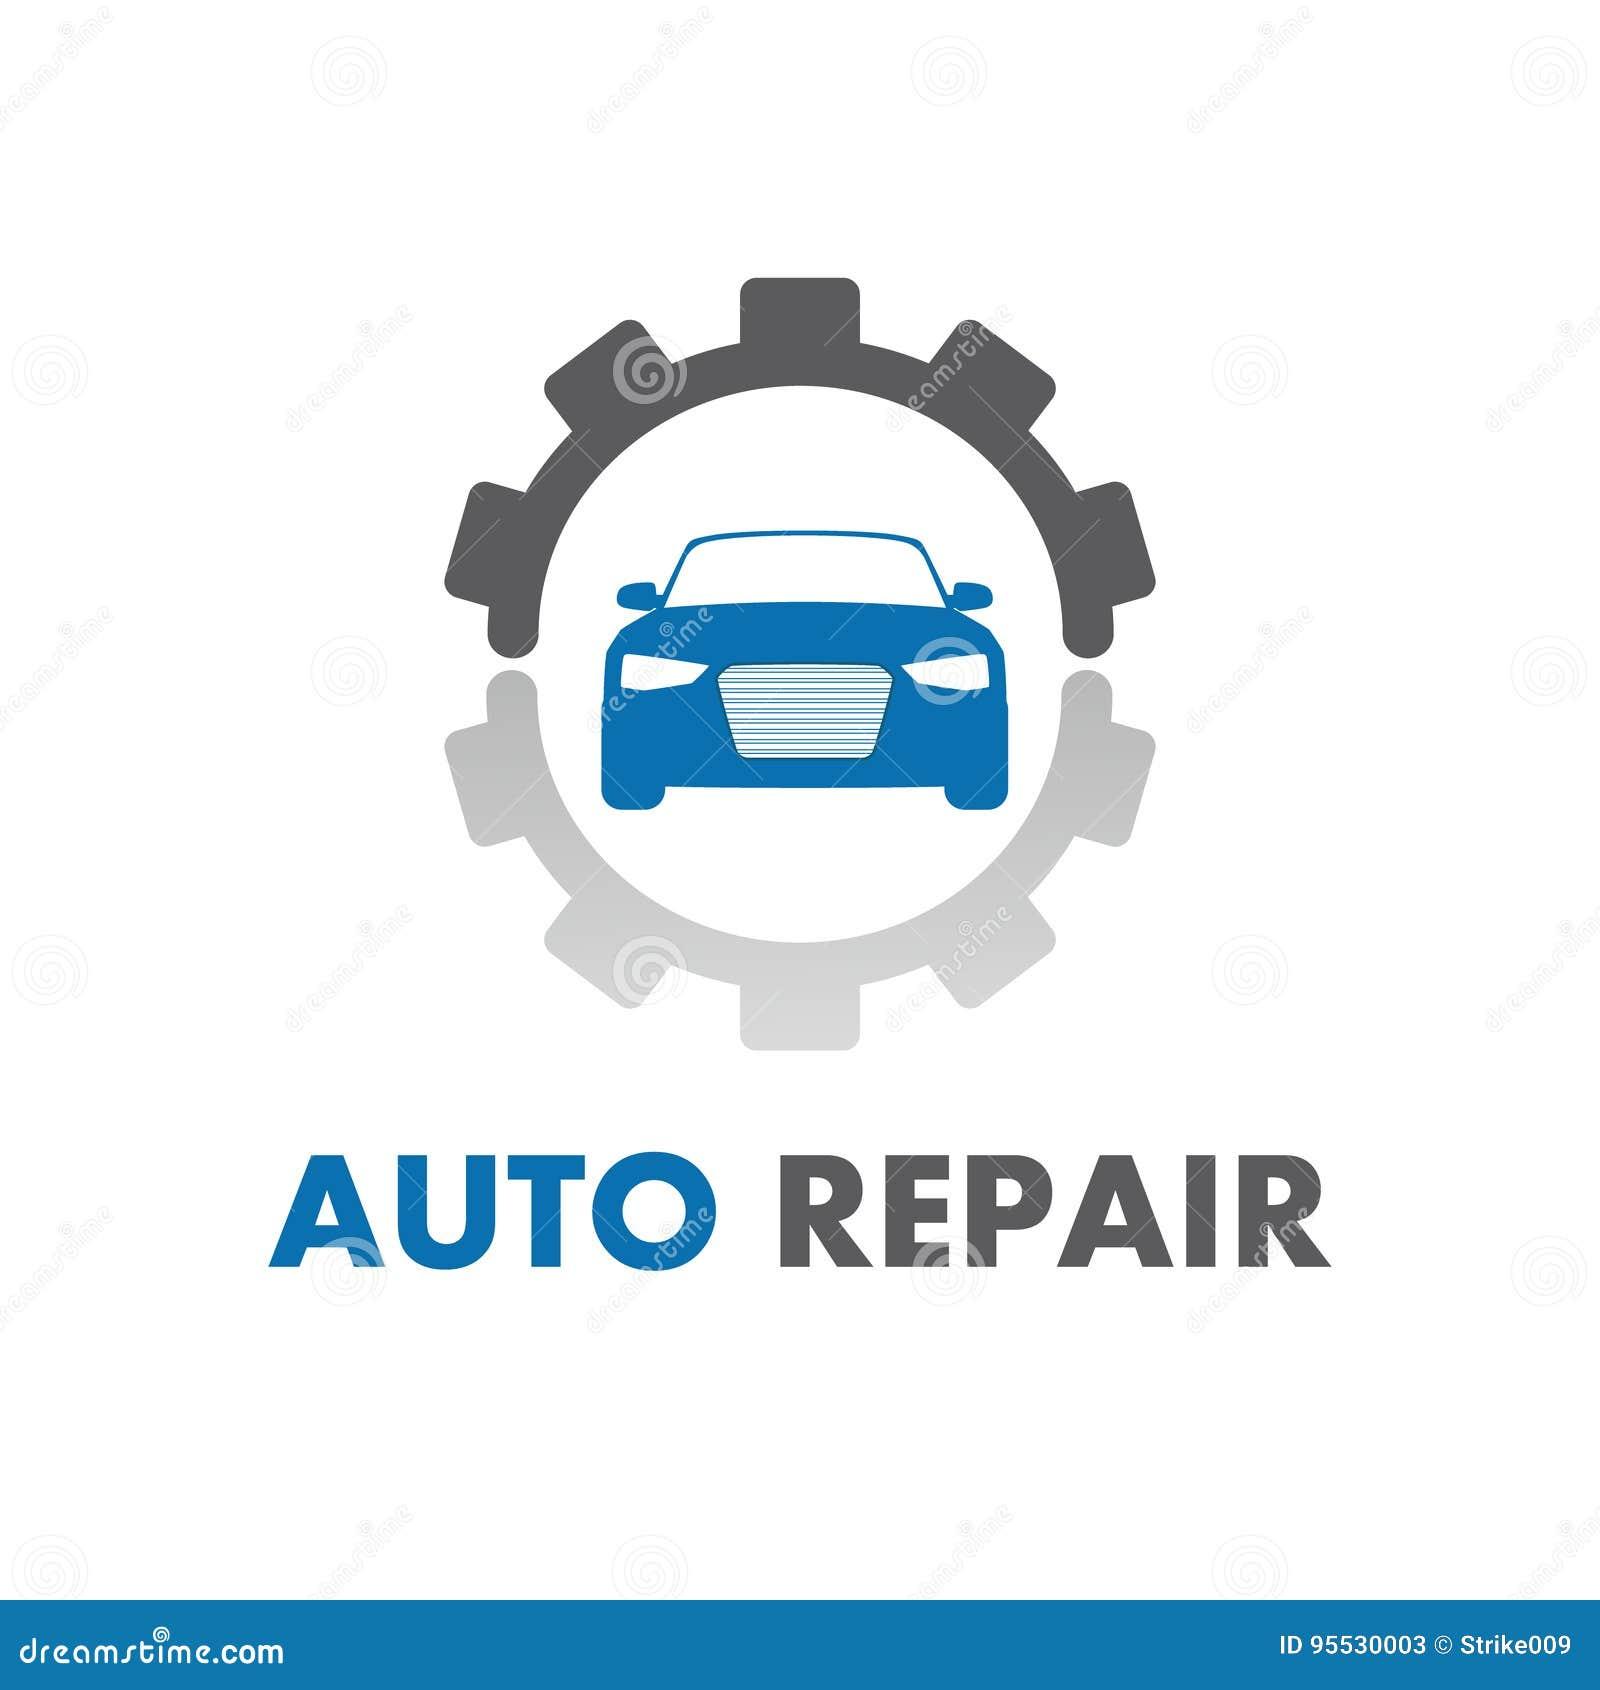 Auto Repair Logo Vector Design Stock Vector Illustration Of Code